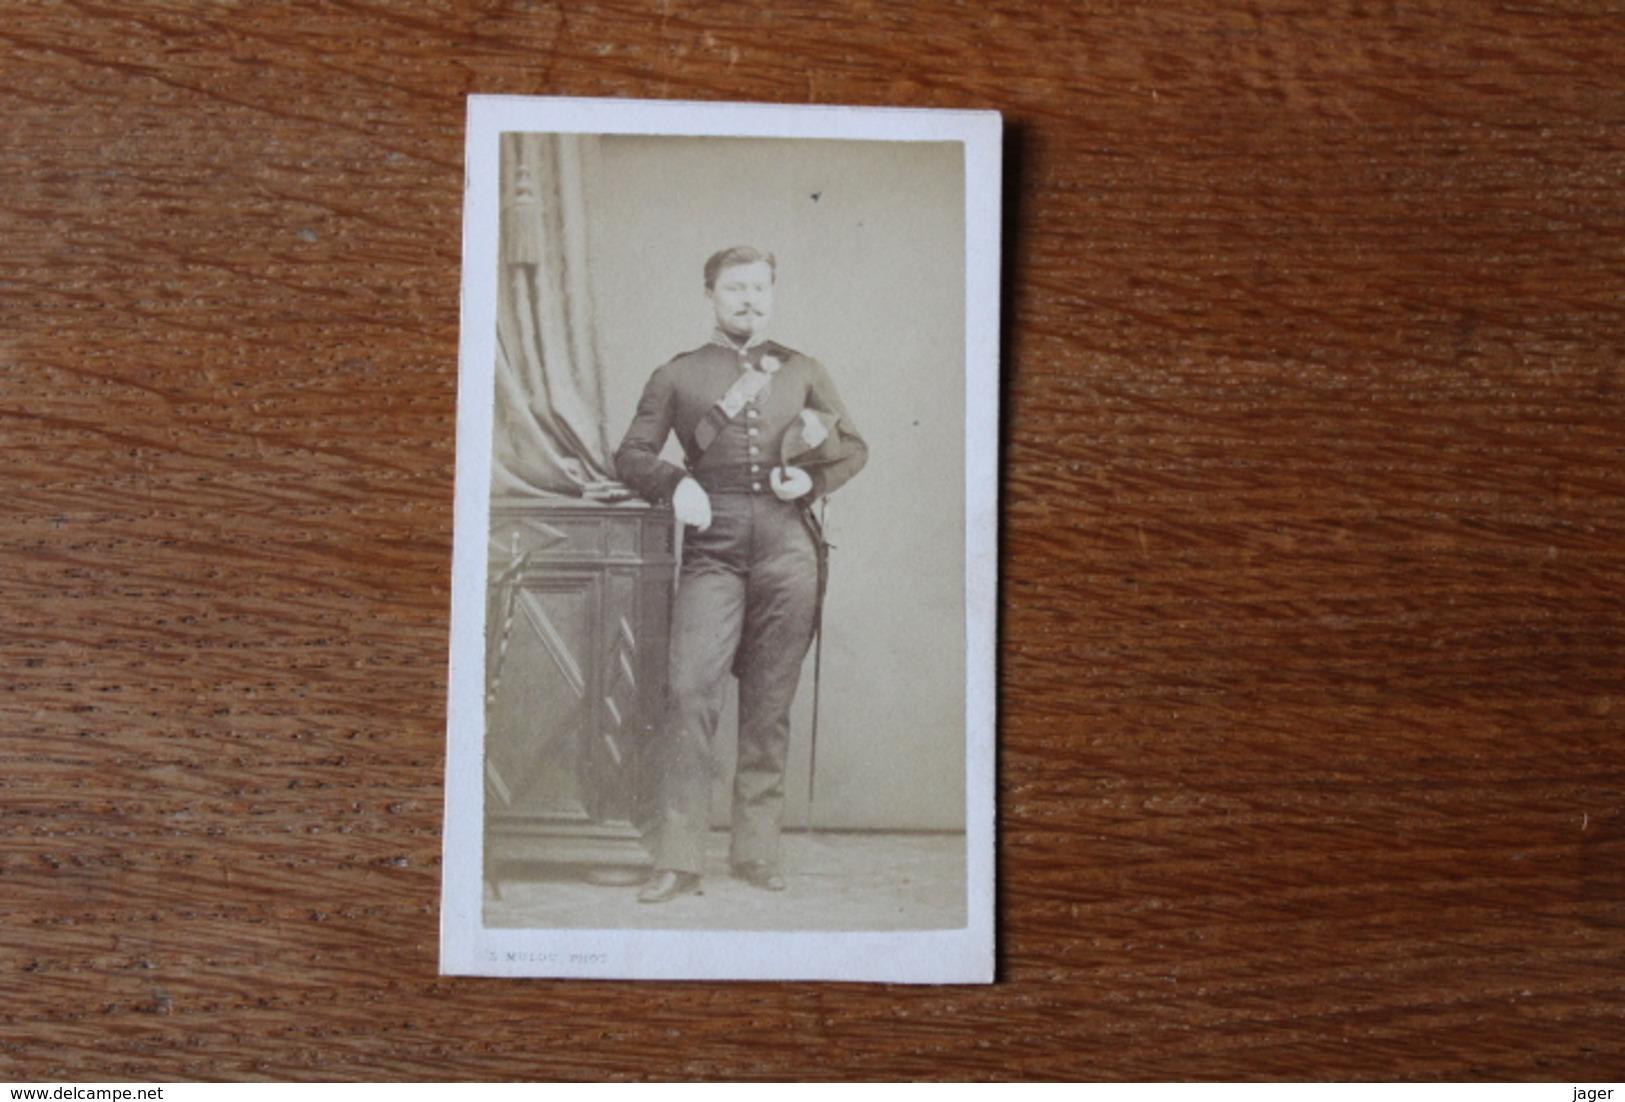 Cdv Second Empire  Officier Medecin  Giberne  Par Mulot - Guerra, Militares